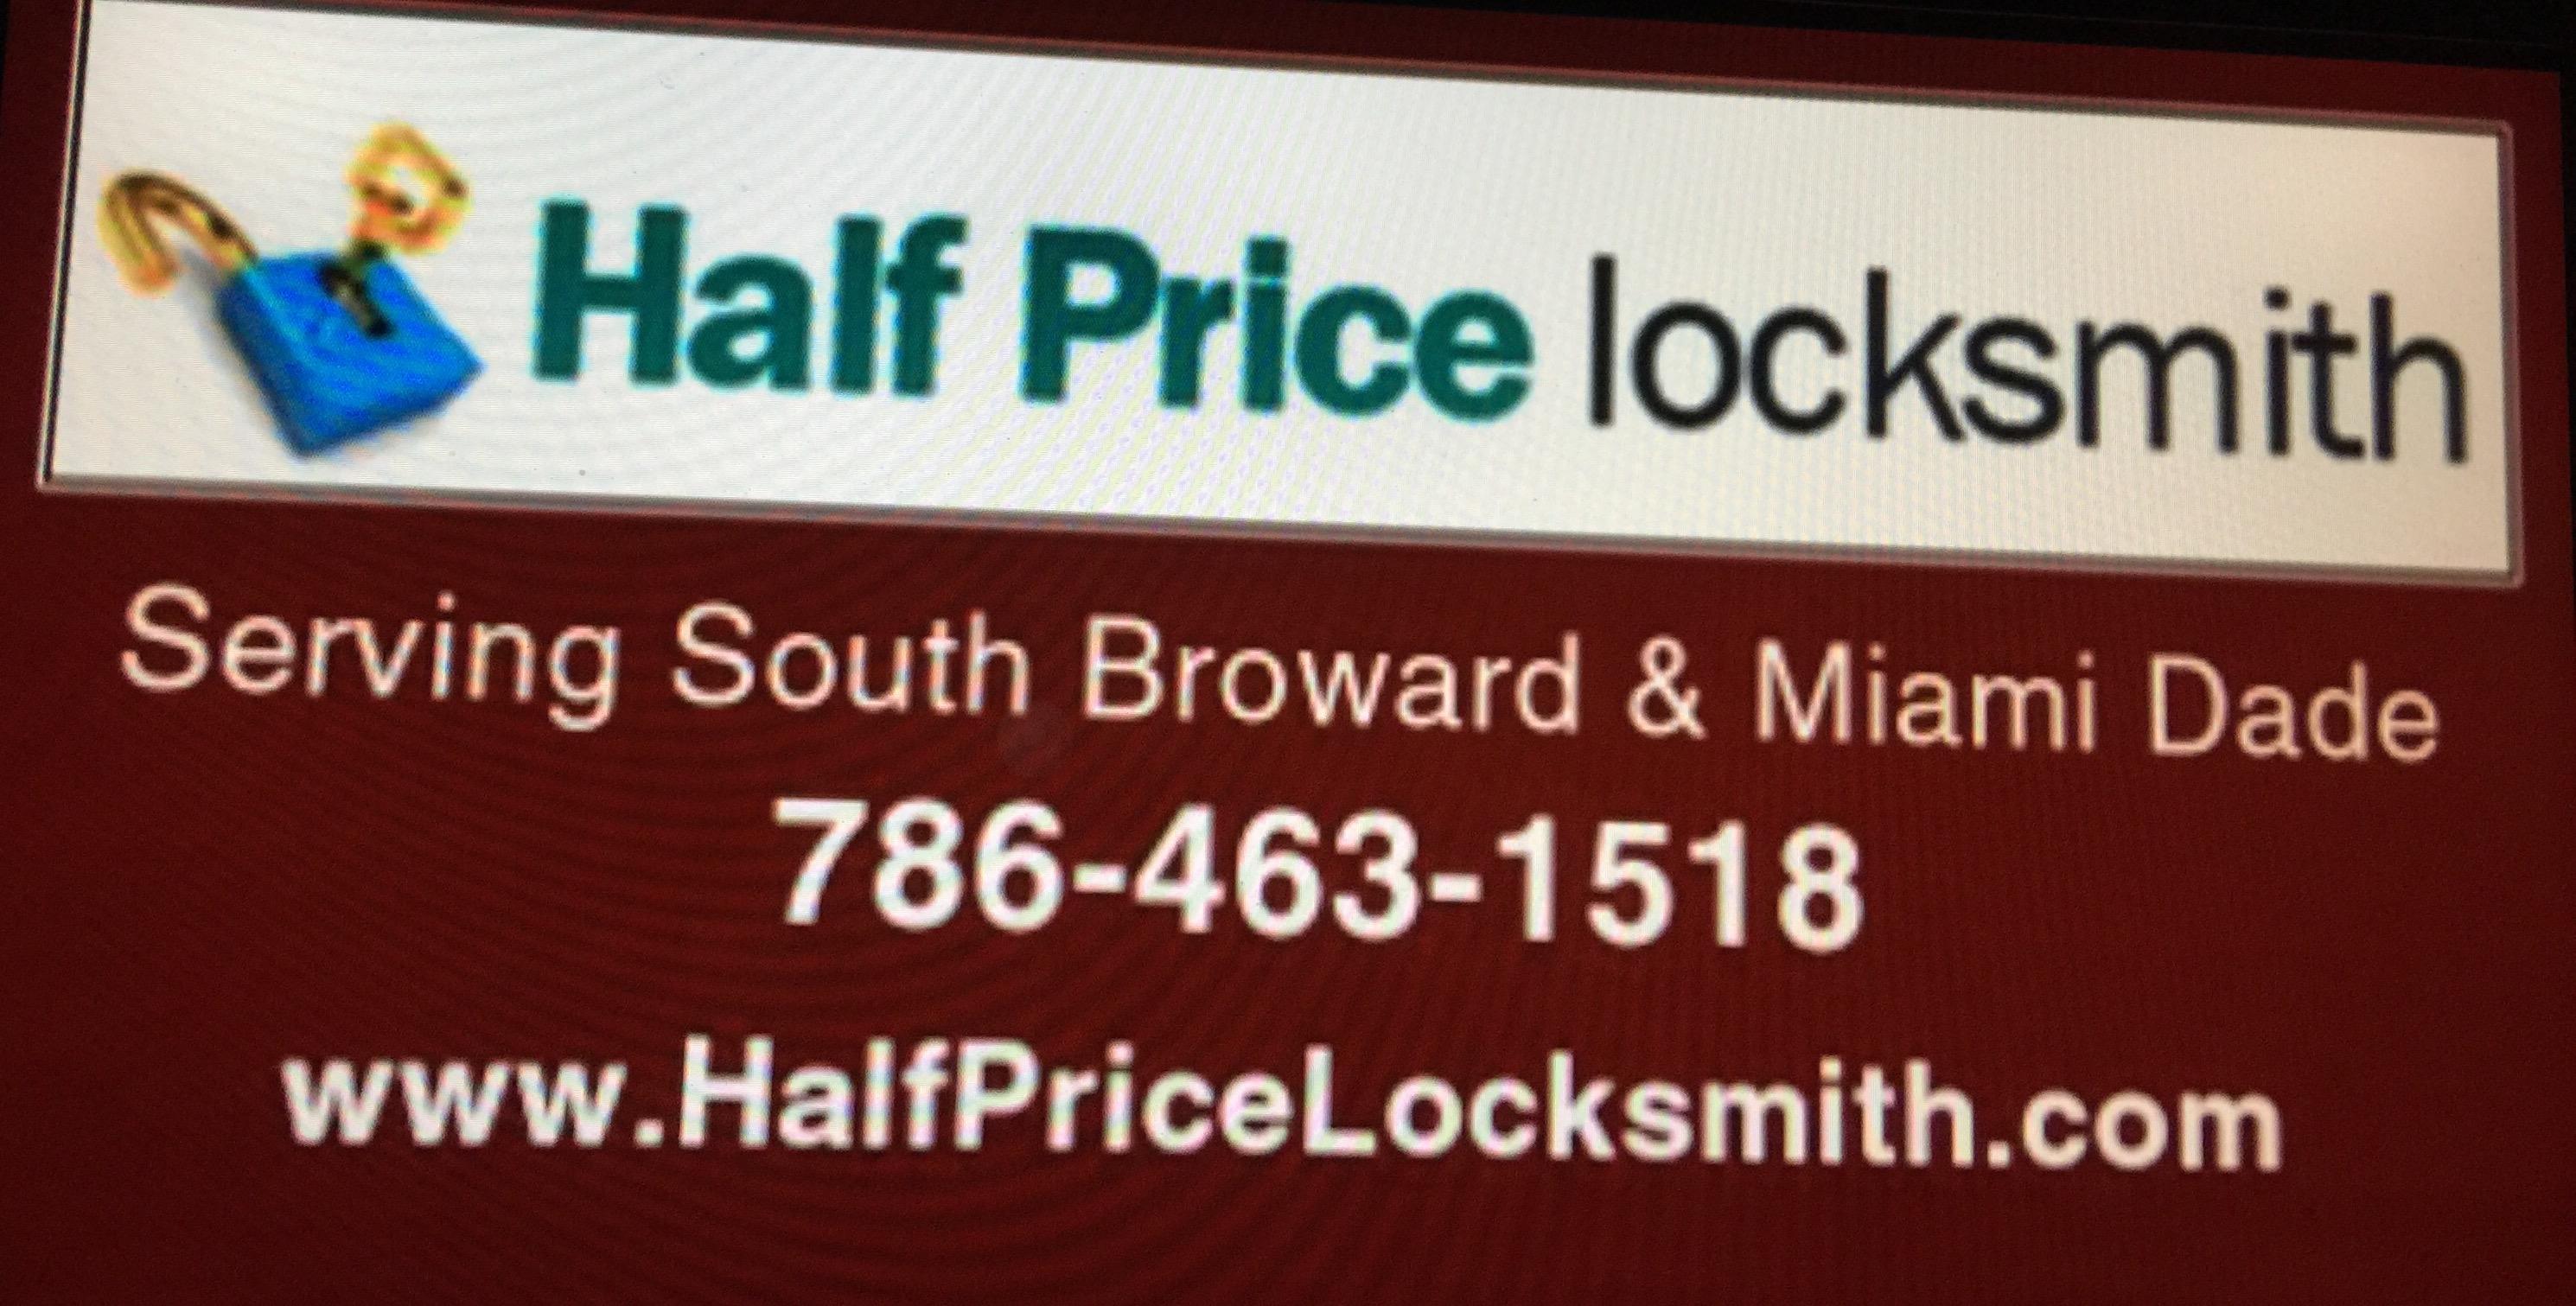 Half Price Locksmith image 13